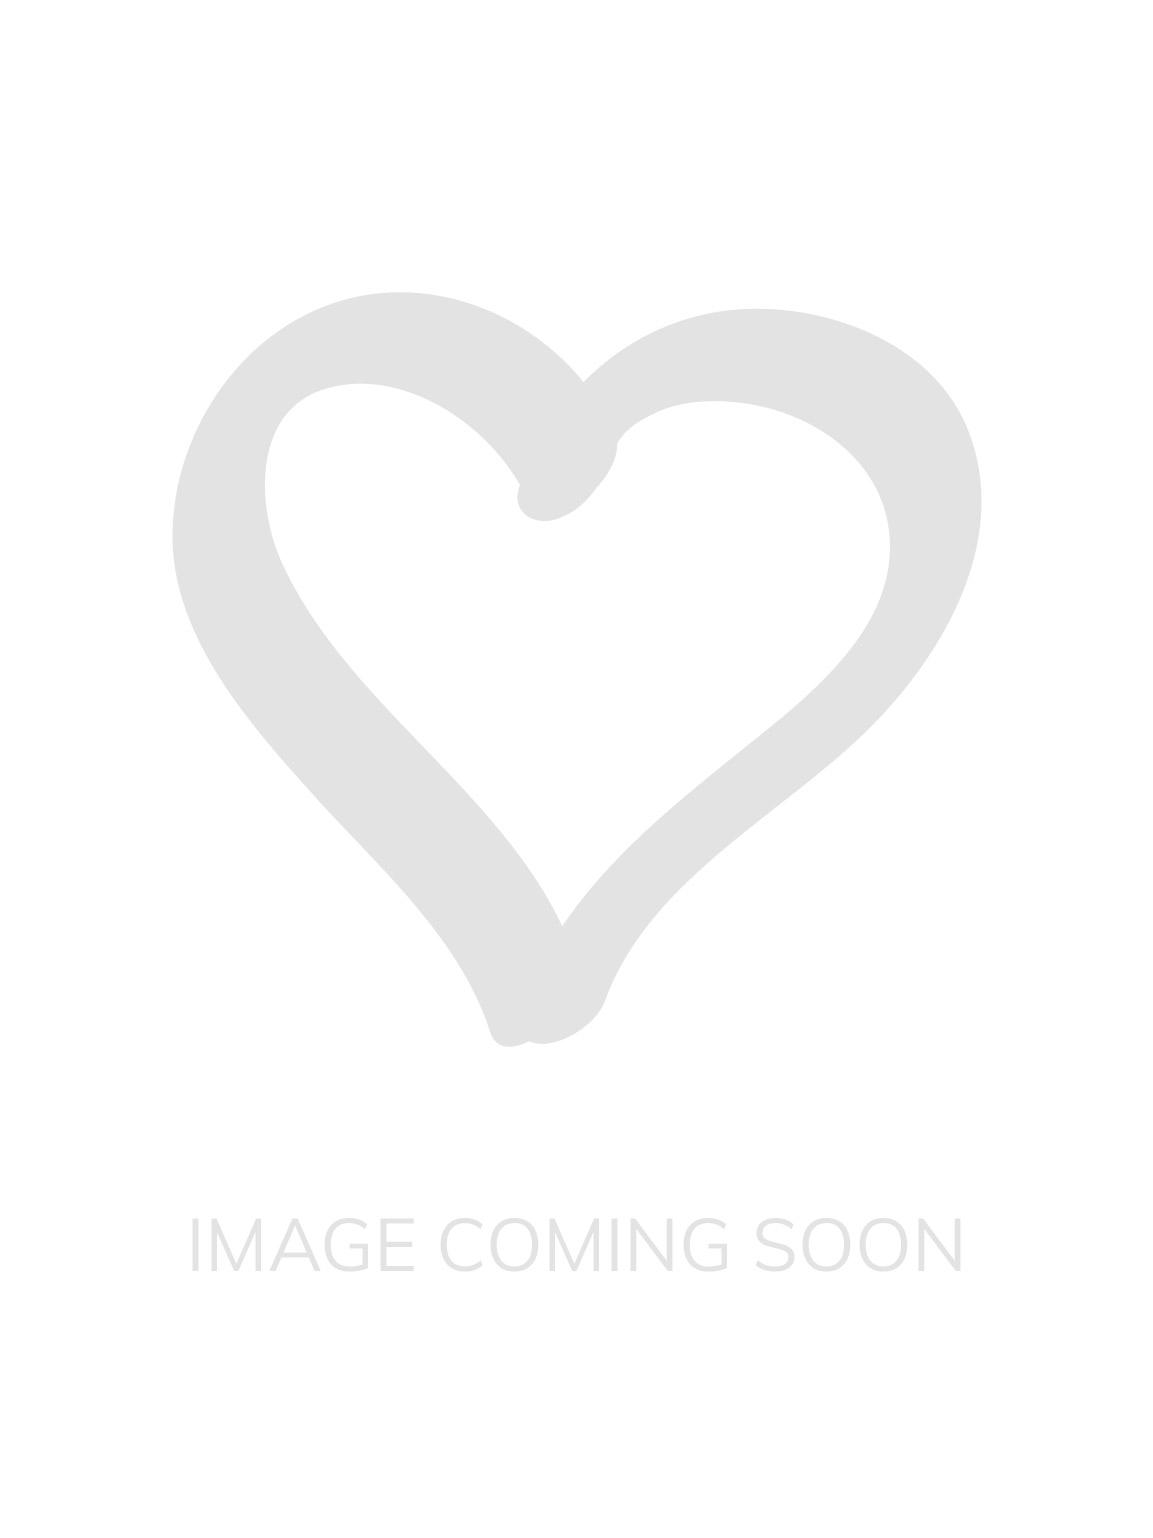 2019 original factory outlets 100% quality quarantee Kala Balcony Bikini Top - Water Blue | Lingerie Outlet Store